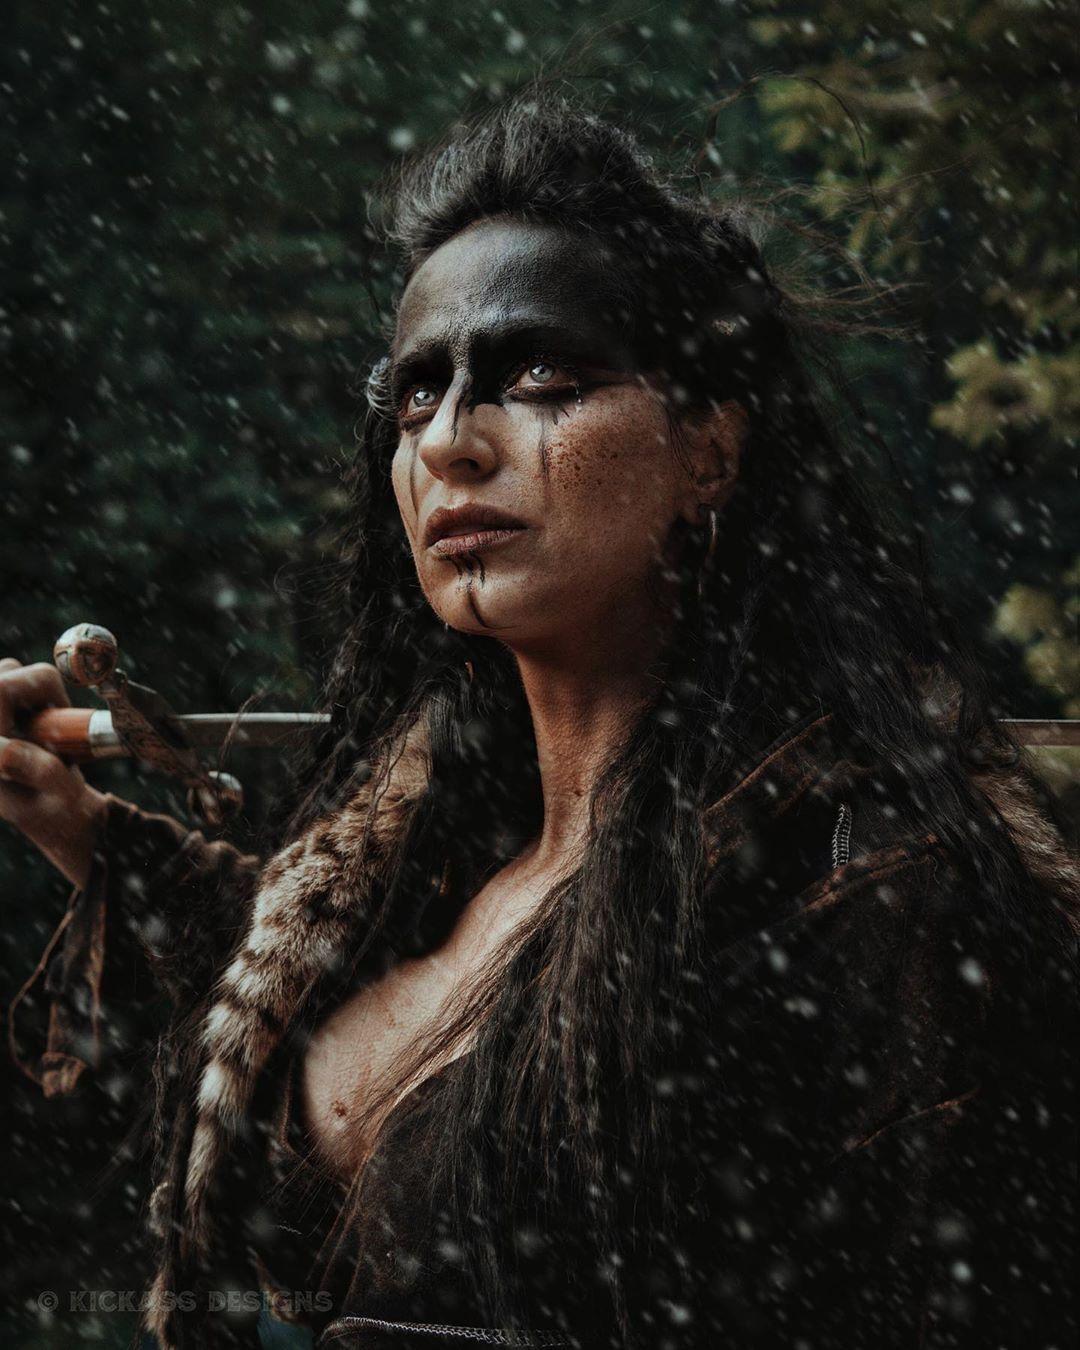 American Revolution Viking Woman Aesthetic Viking Woman Aesthetic Nordic Viking Women Viking Woman Illust In 2020 Viking Aesthetic Viking Cosplay Viking Makeup